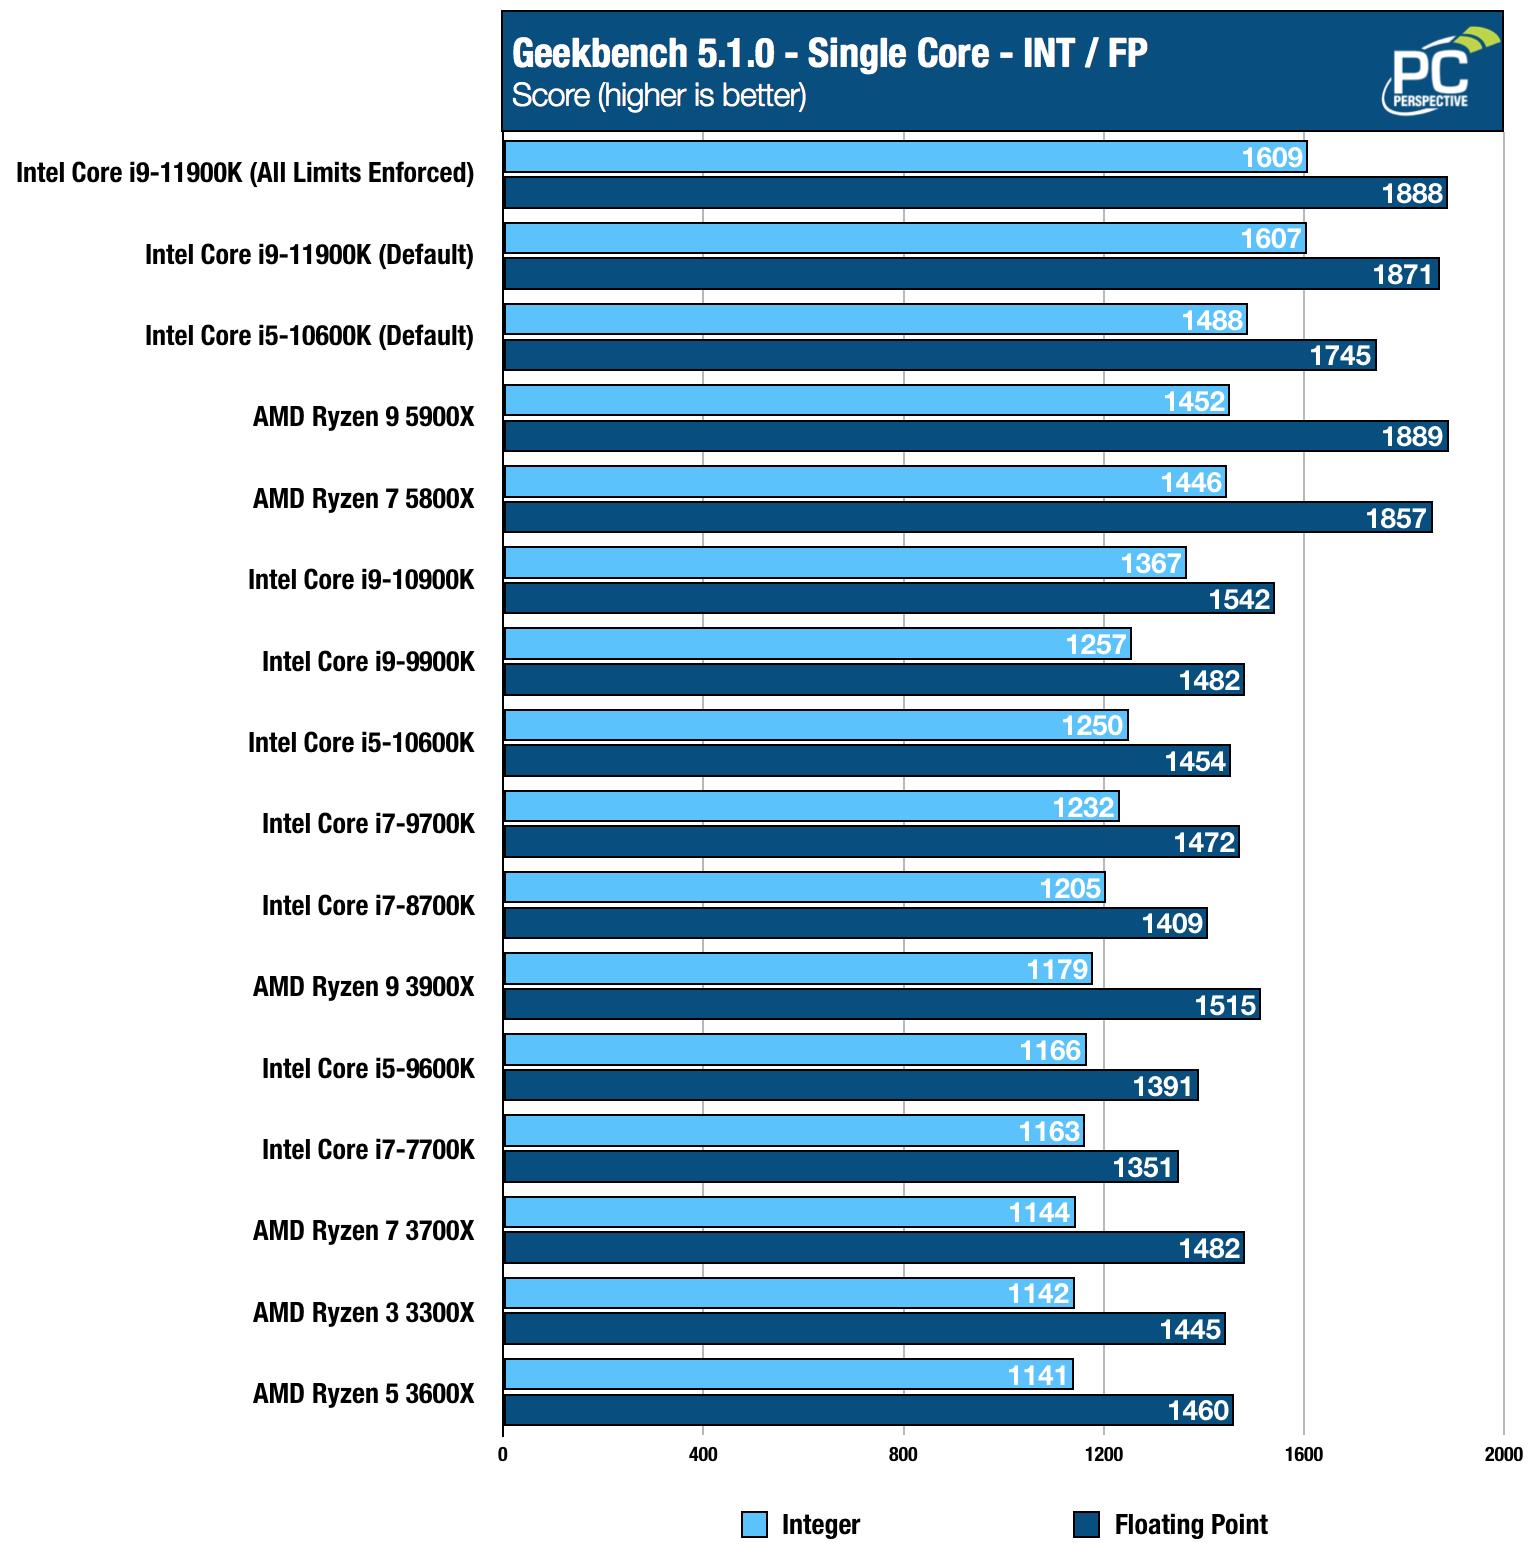 Intel Core i9-11900K i5-11600K Geekbench Single Chart